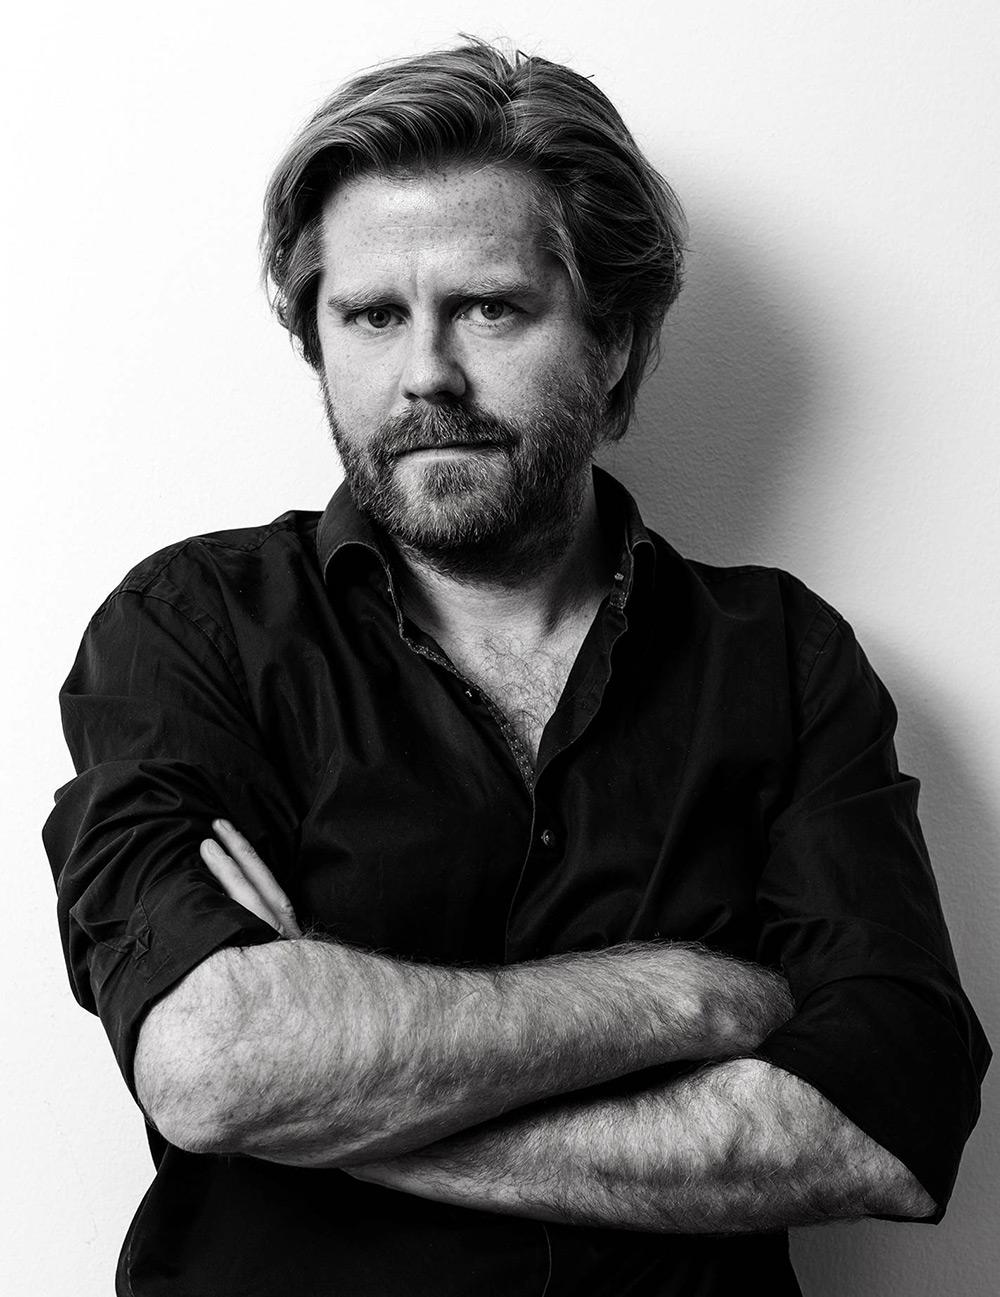 Fig. 1: Janus Metz. Foto: Natascha Thiara Rydvald.